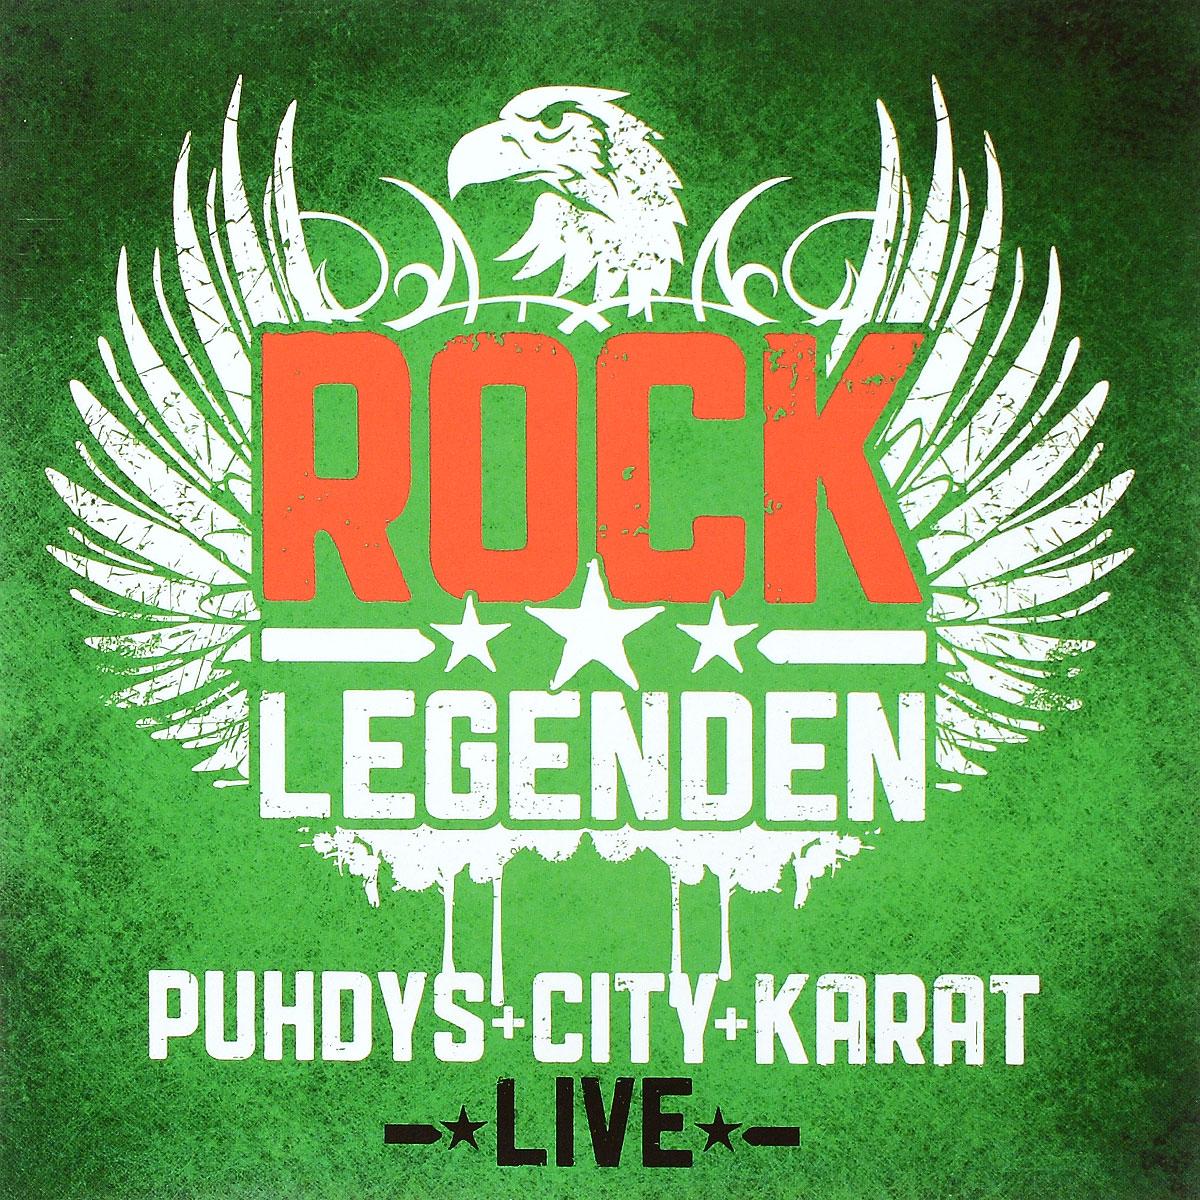 Puhdys + City + Karat. Rock Legenden Live (2 CD)